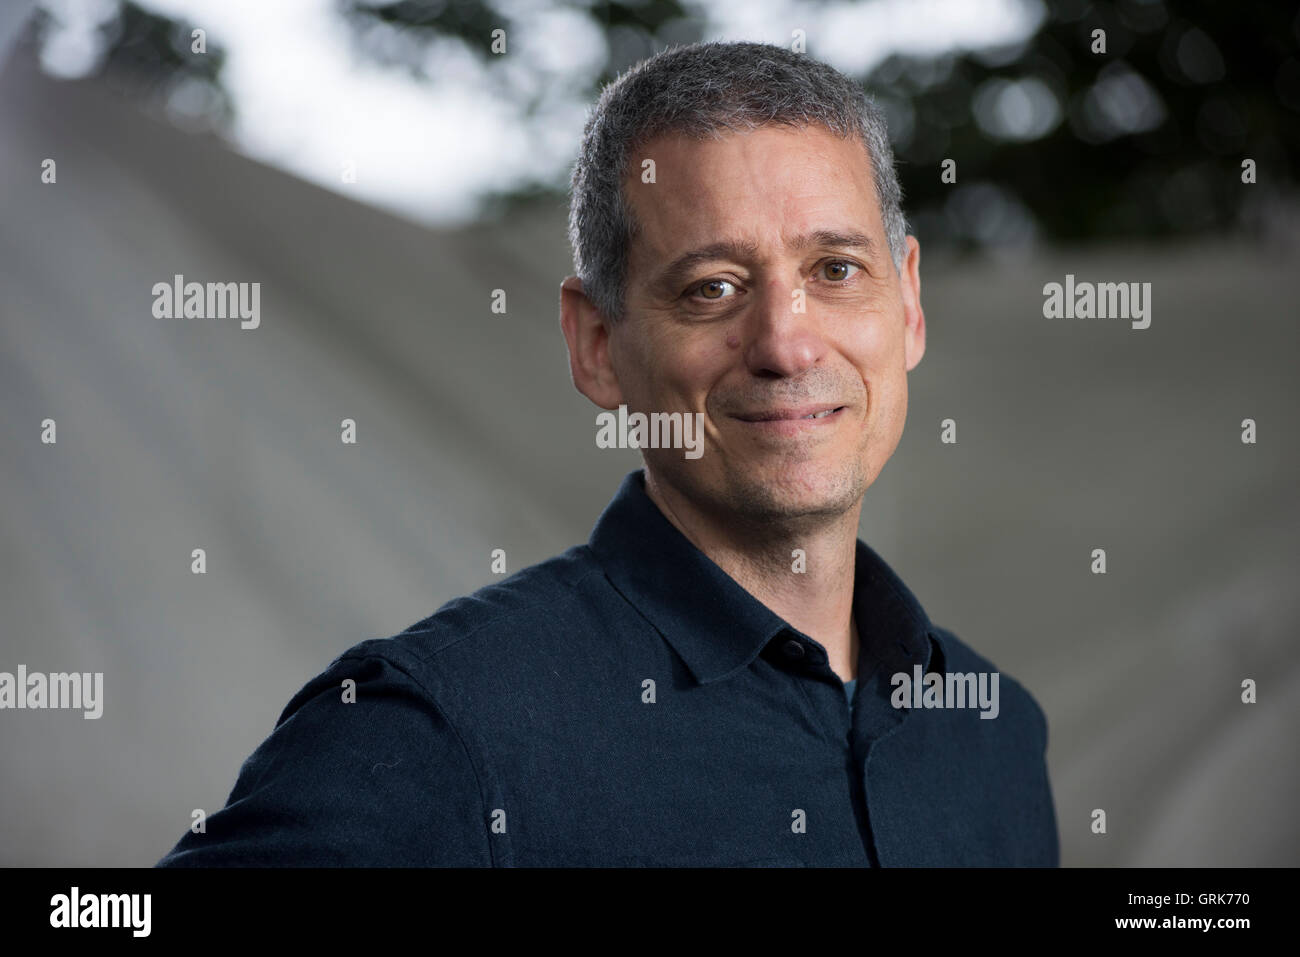 English Journalist Jeremy Gavron. - Stock Image